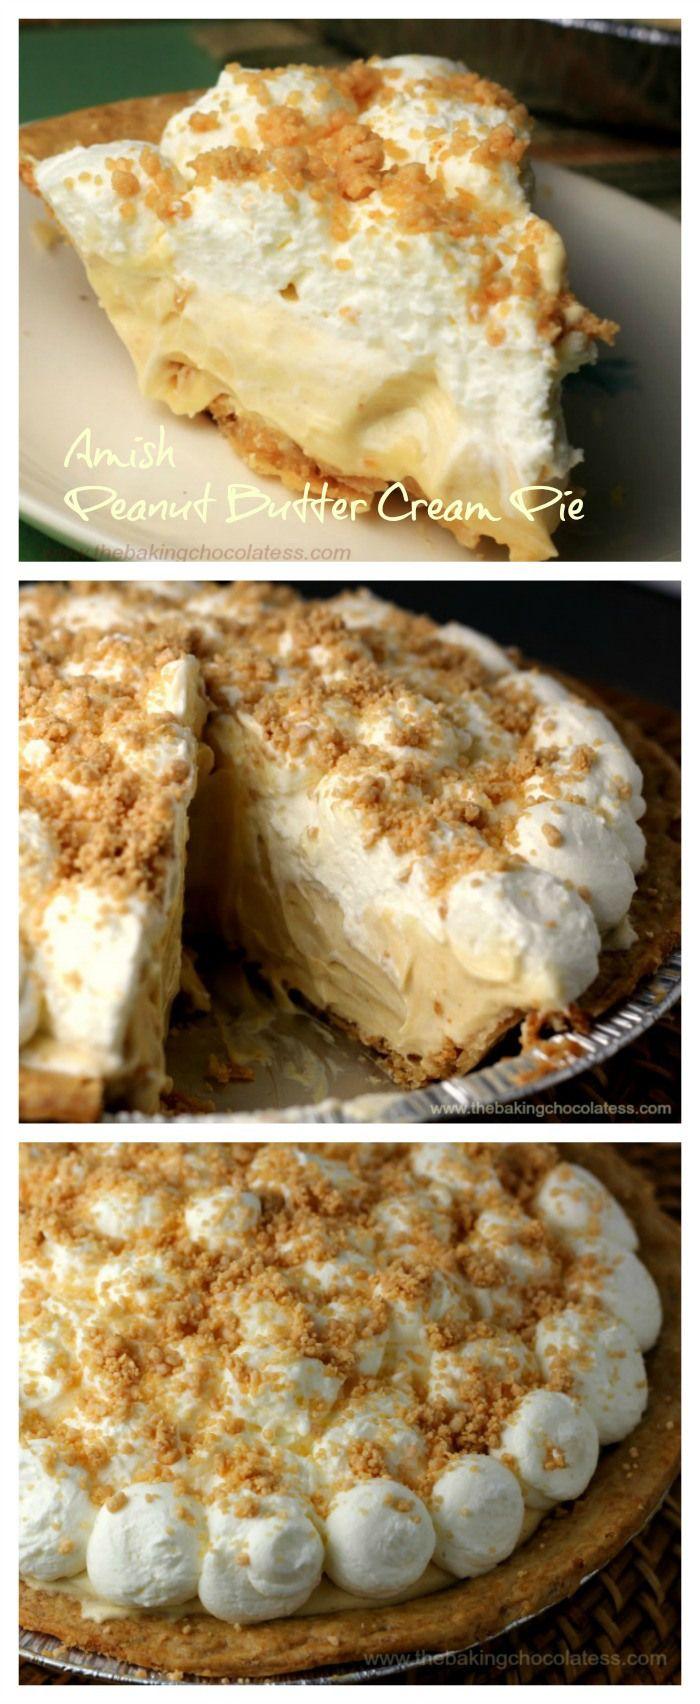 Amish Peanut Butter Cream Pie – The Baking ChocolaTess